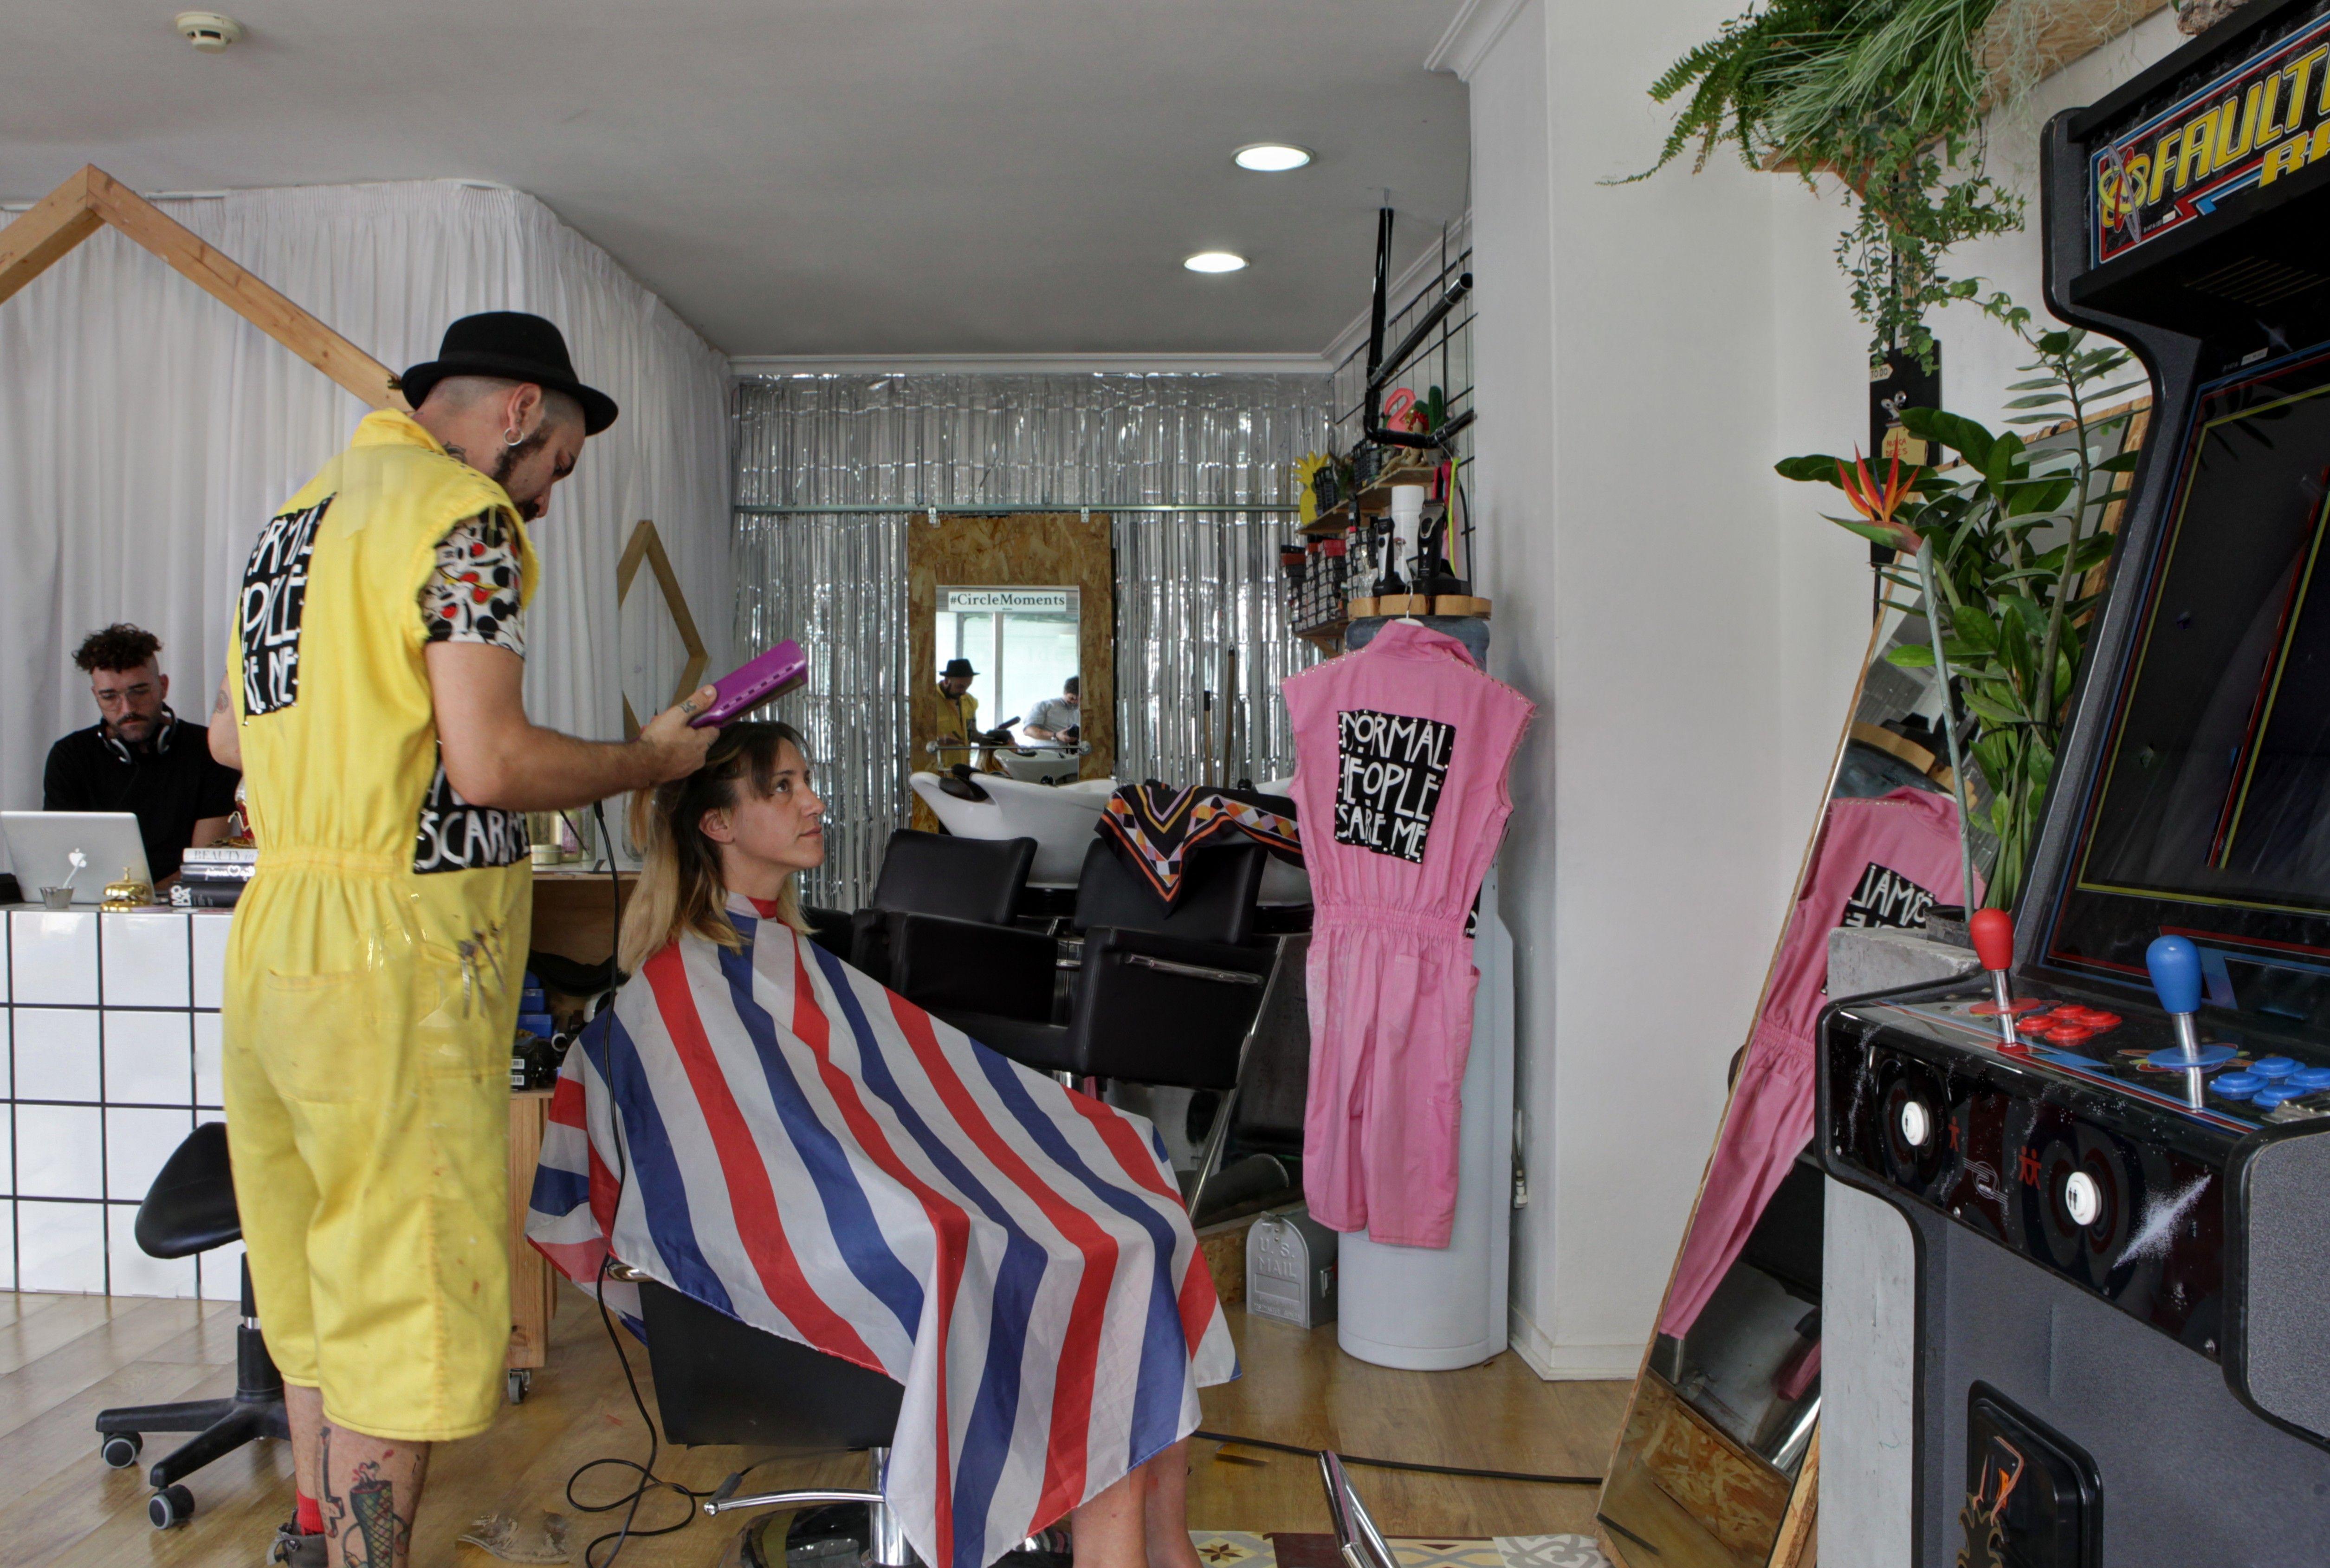 Peluquería unisex en Ibiza